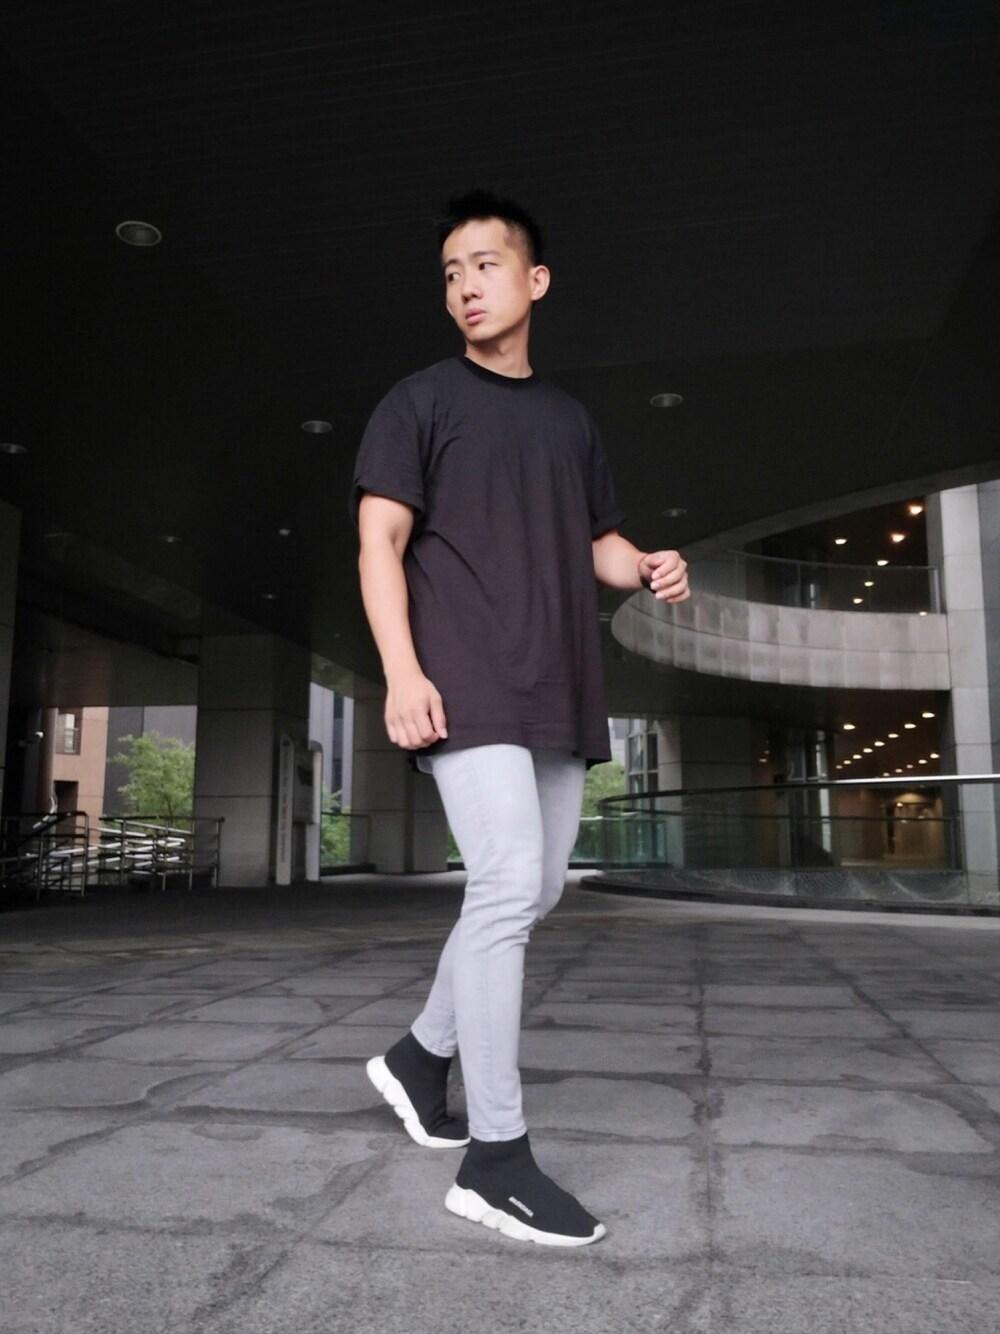 haoyu│BALENCIAGA Sneakers Looks - WEAR